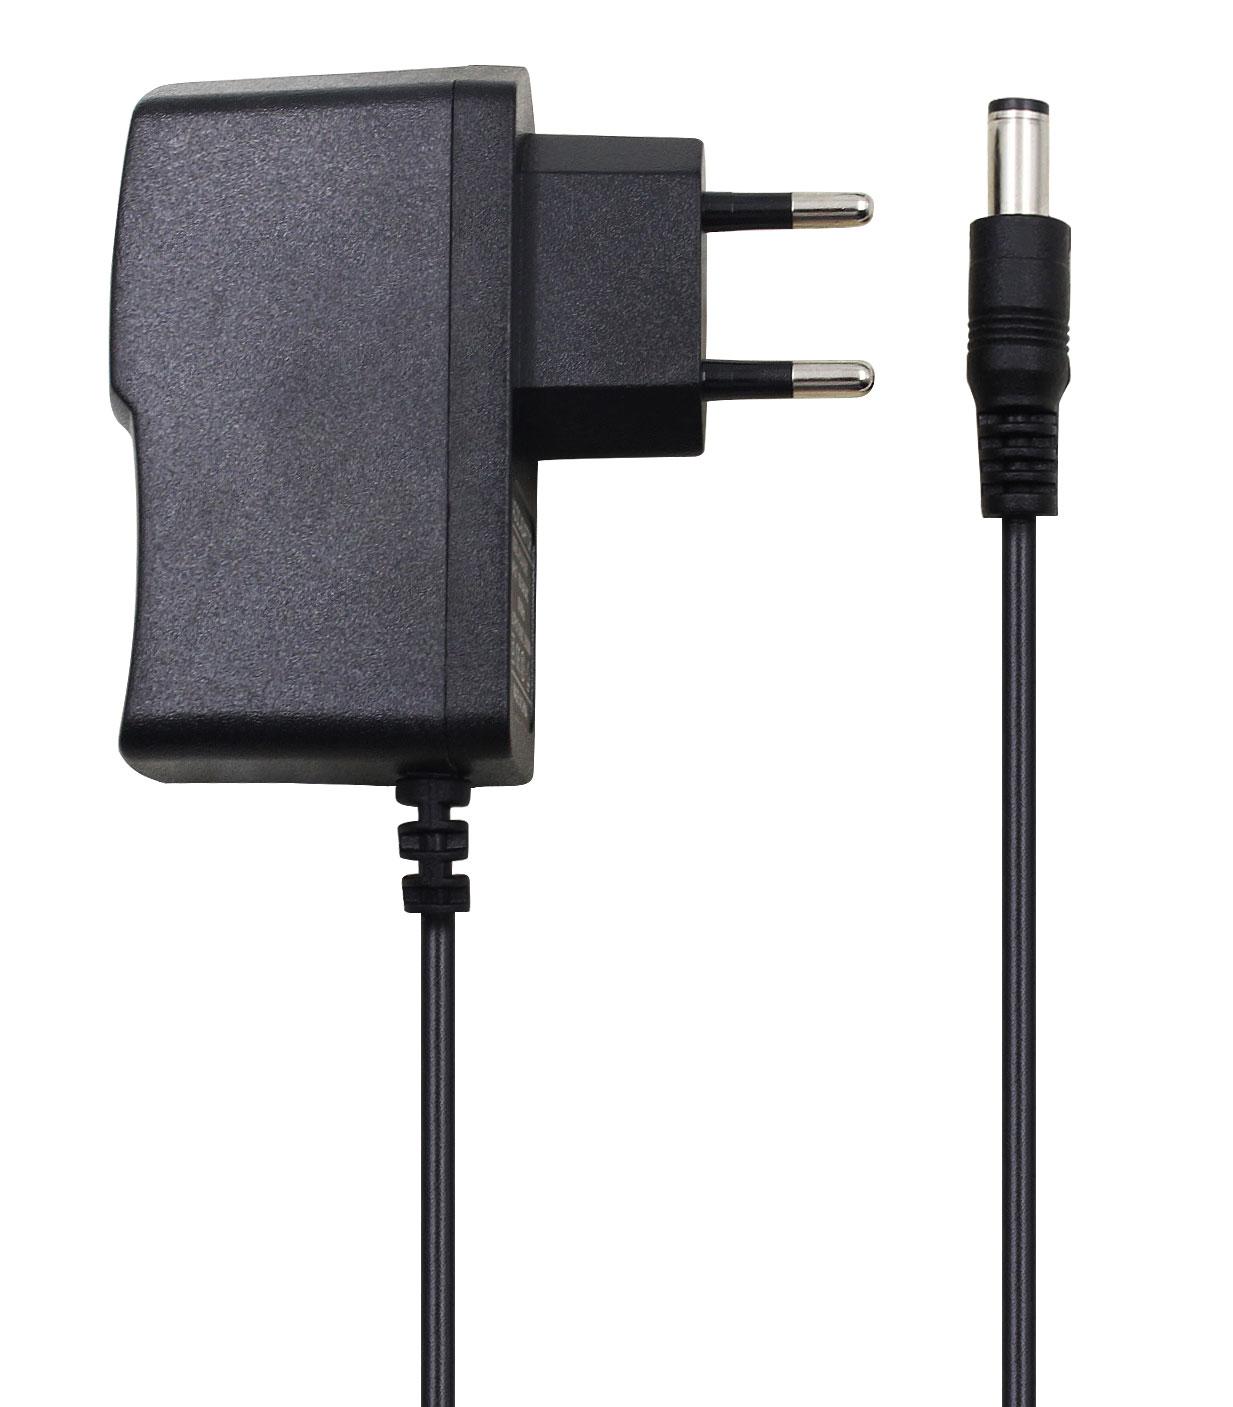 US Power Supply AC Adapter cord plug For Beelink mini MXIII ii S905x Core TV Box